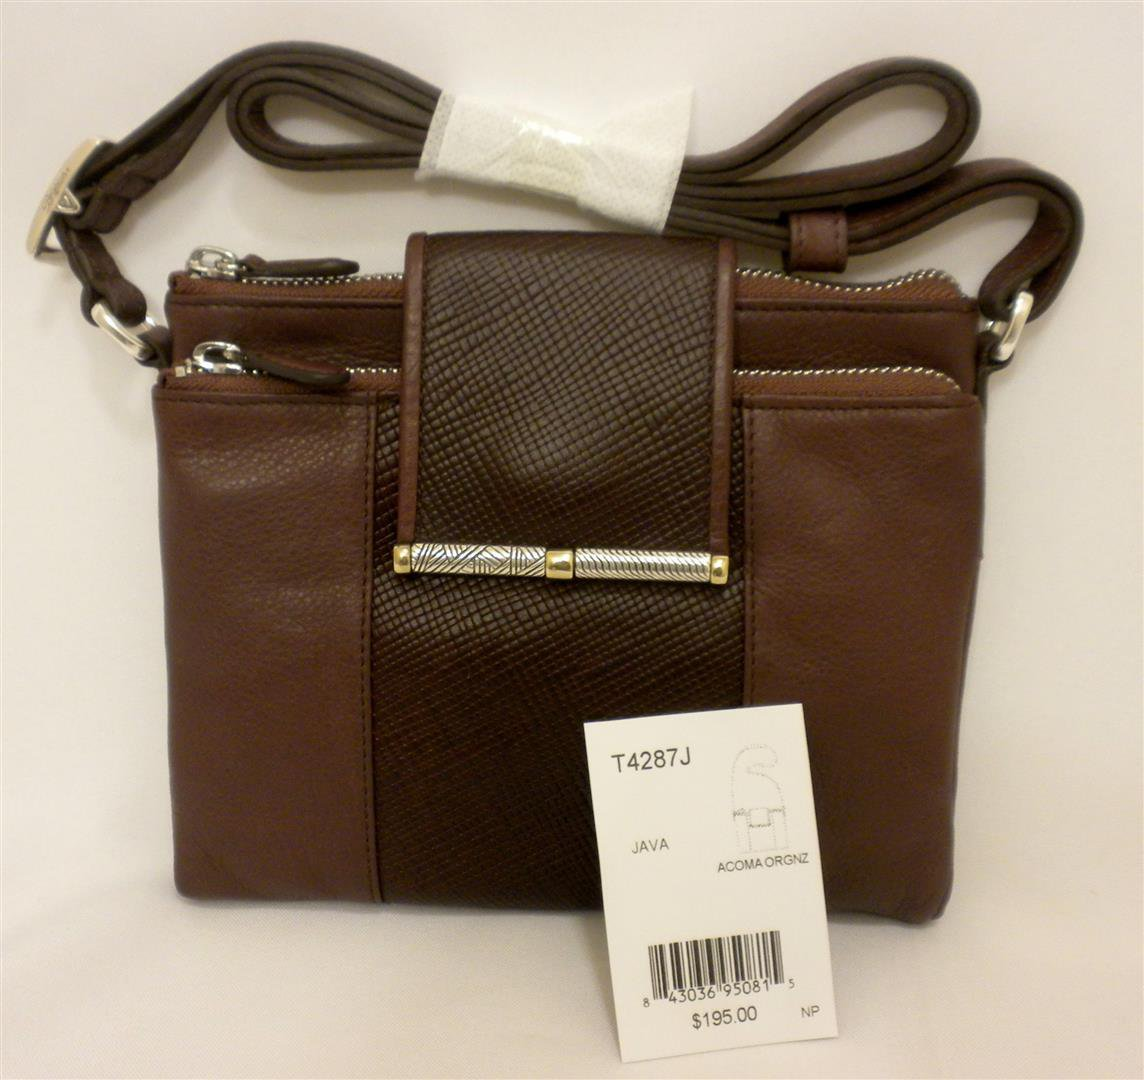 Brighton ACOMA Wallet Organizer Crossbody Bag Java Brown Leather T4287J NWT